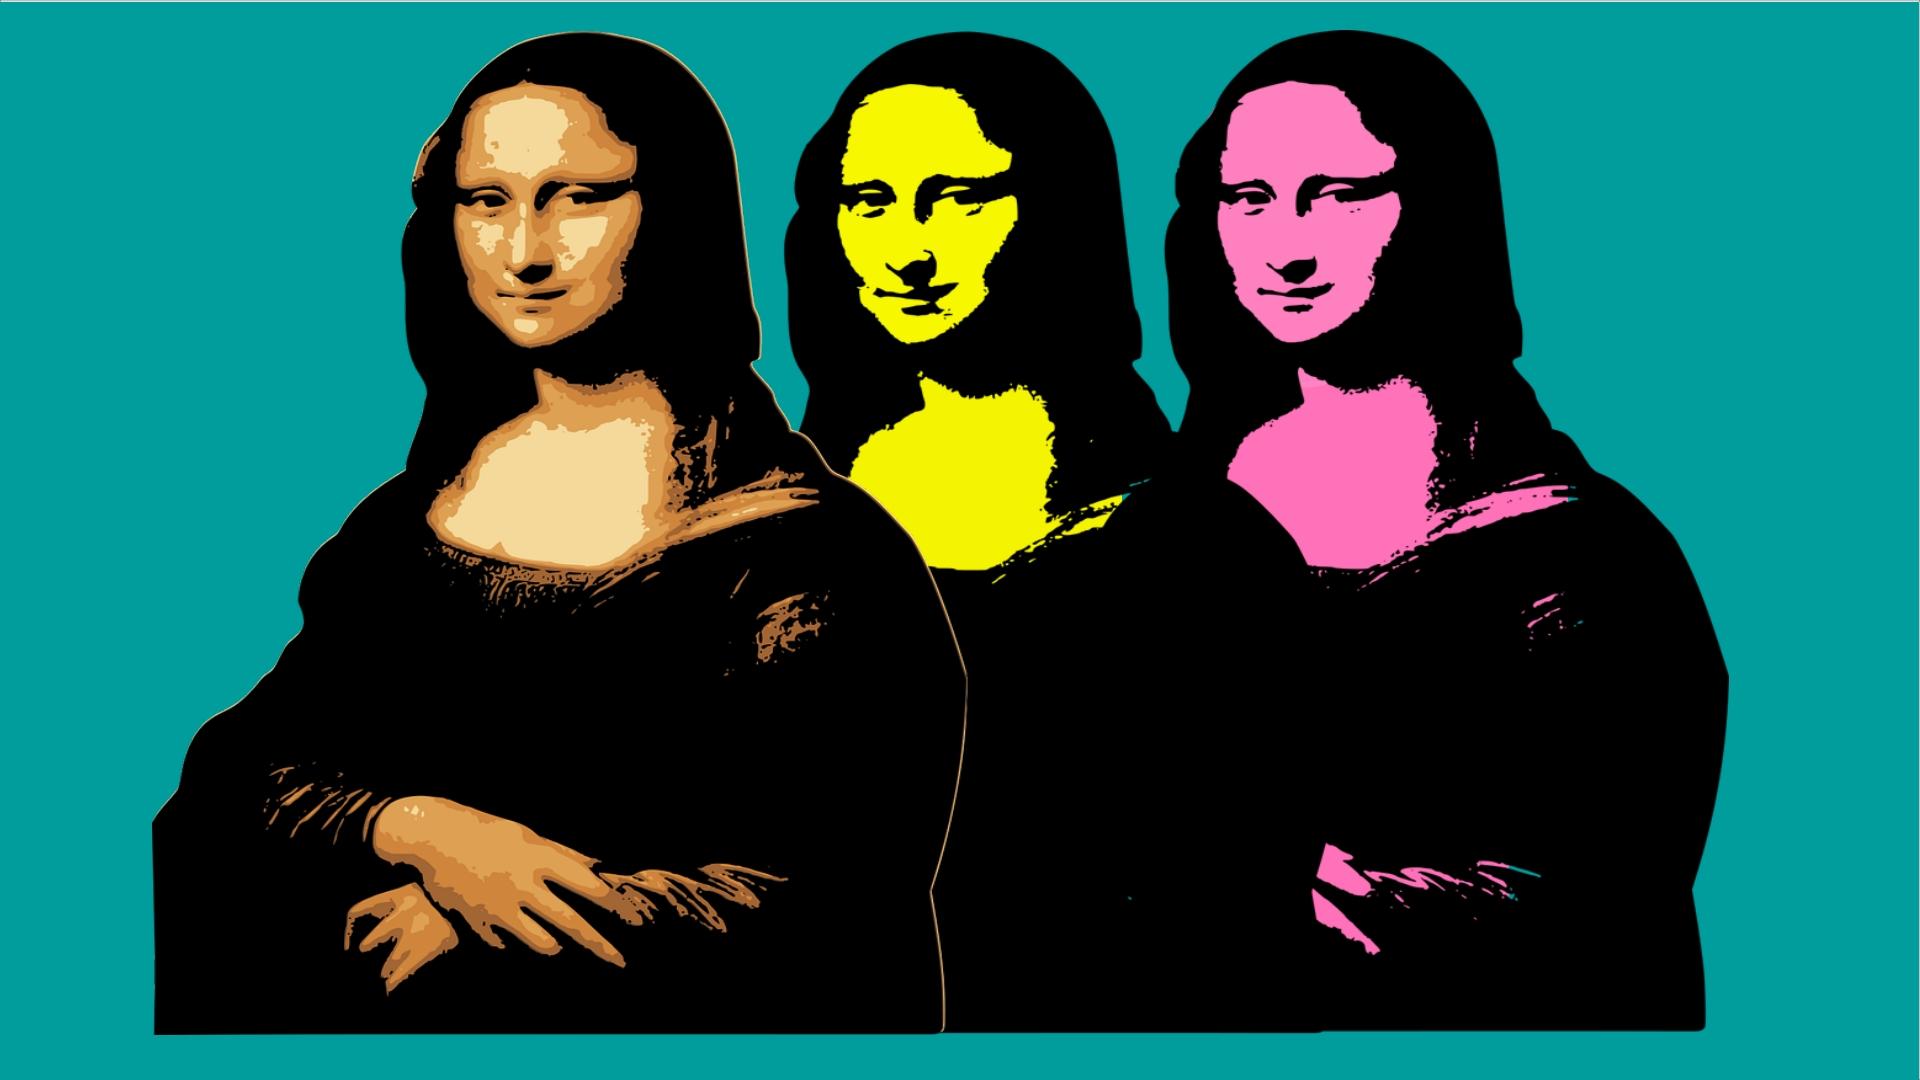 Mona Lisa w wersji pop art beżowa,różowa i zólta na turkusowym tle